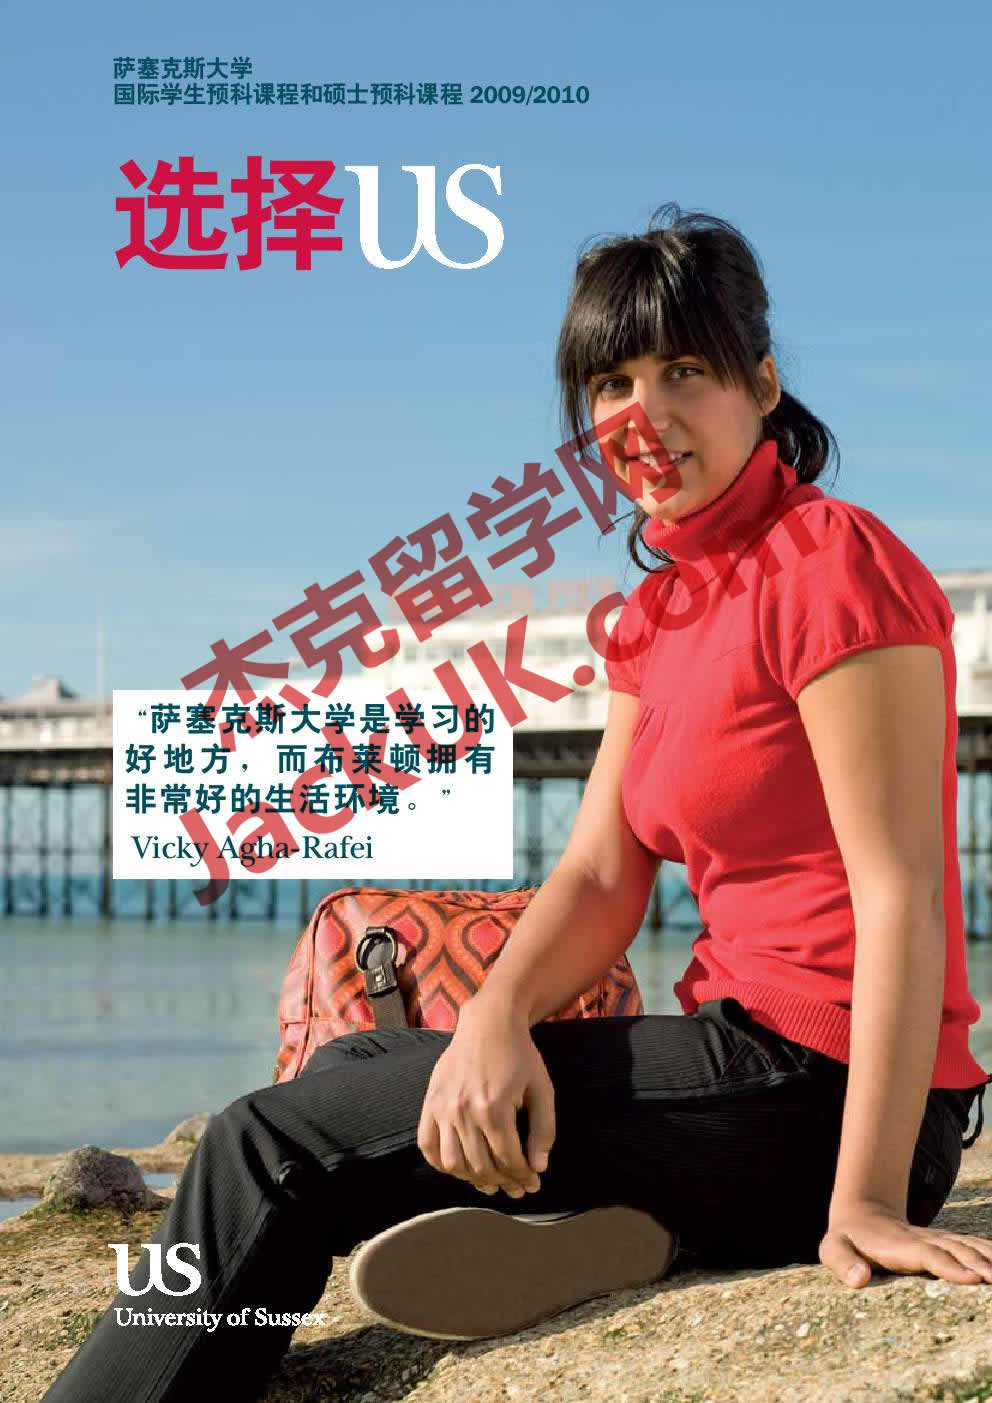 萨塞克斯大学 (University of Sussex) - 第1页